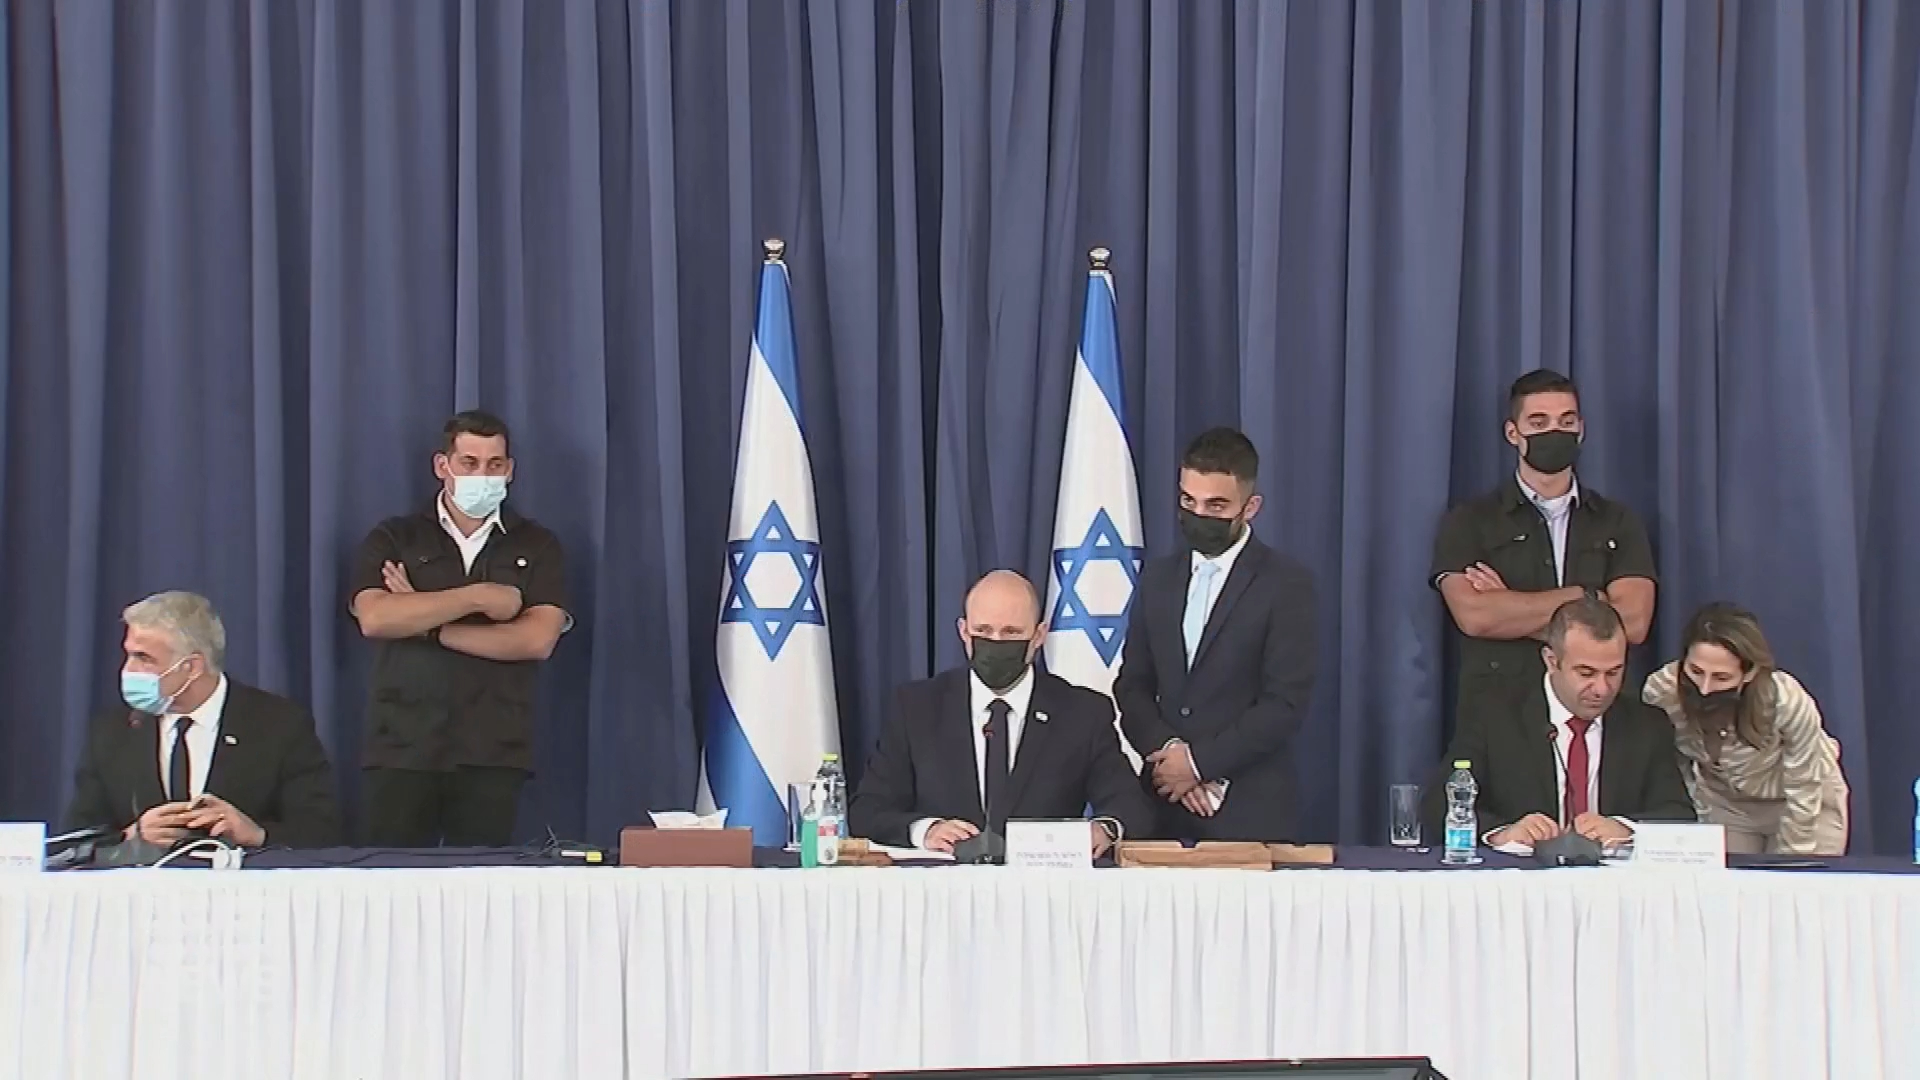 Israel to offer third Pfizer shot